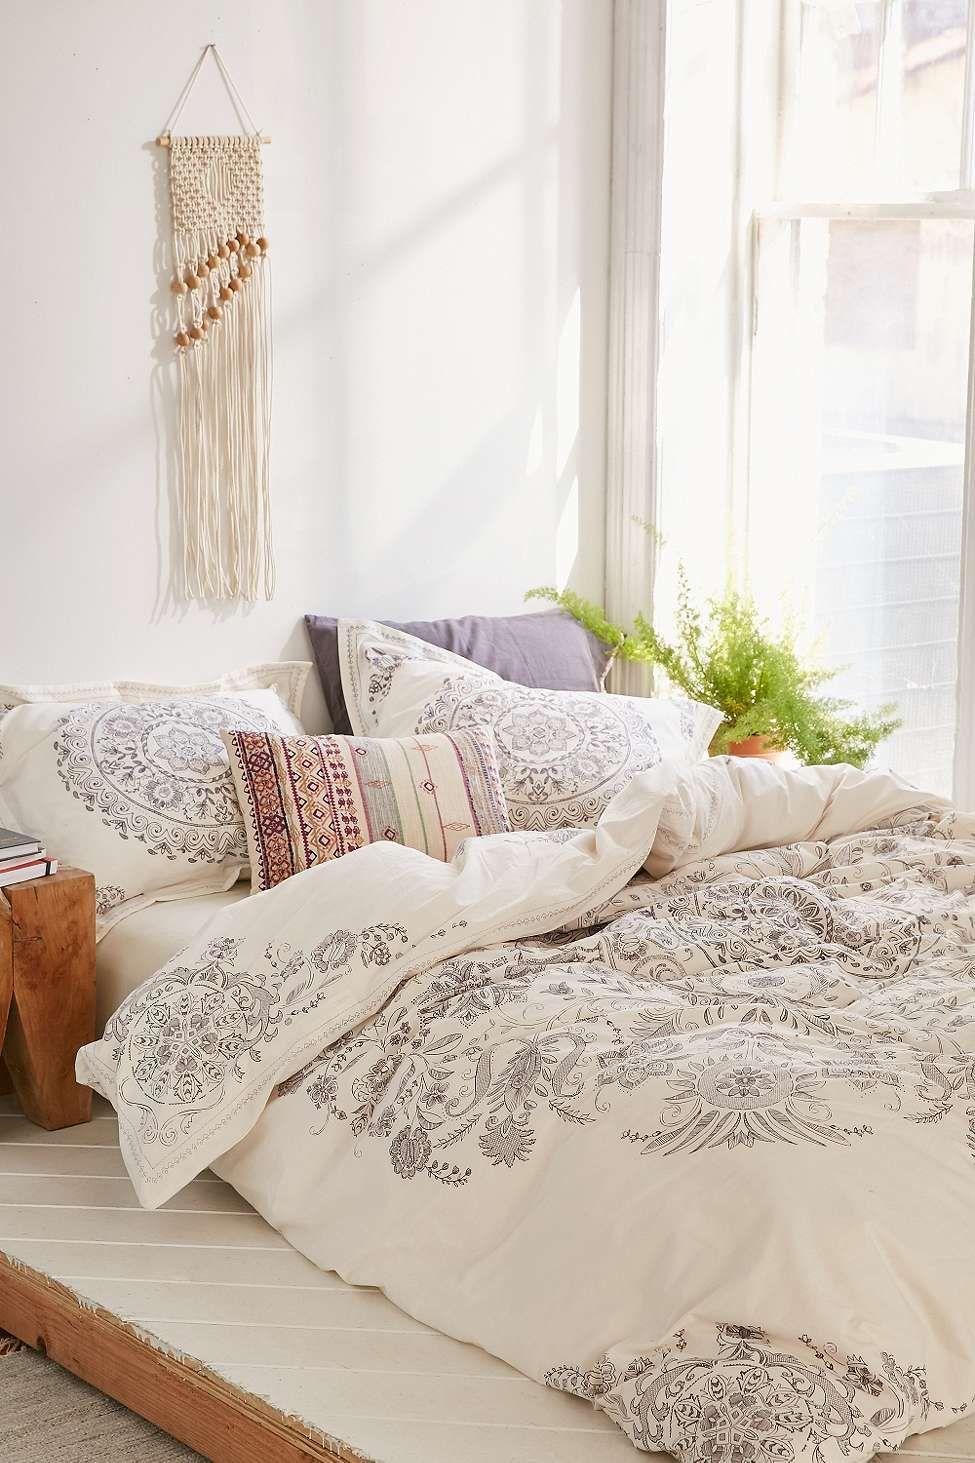 Bettbezug louise femme mit medaillonmuster that comfy for Wohnung aussortieren